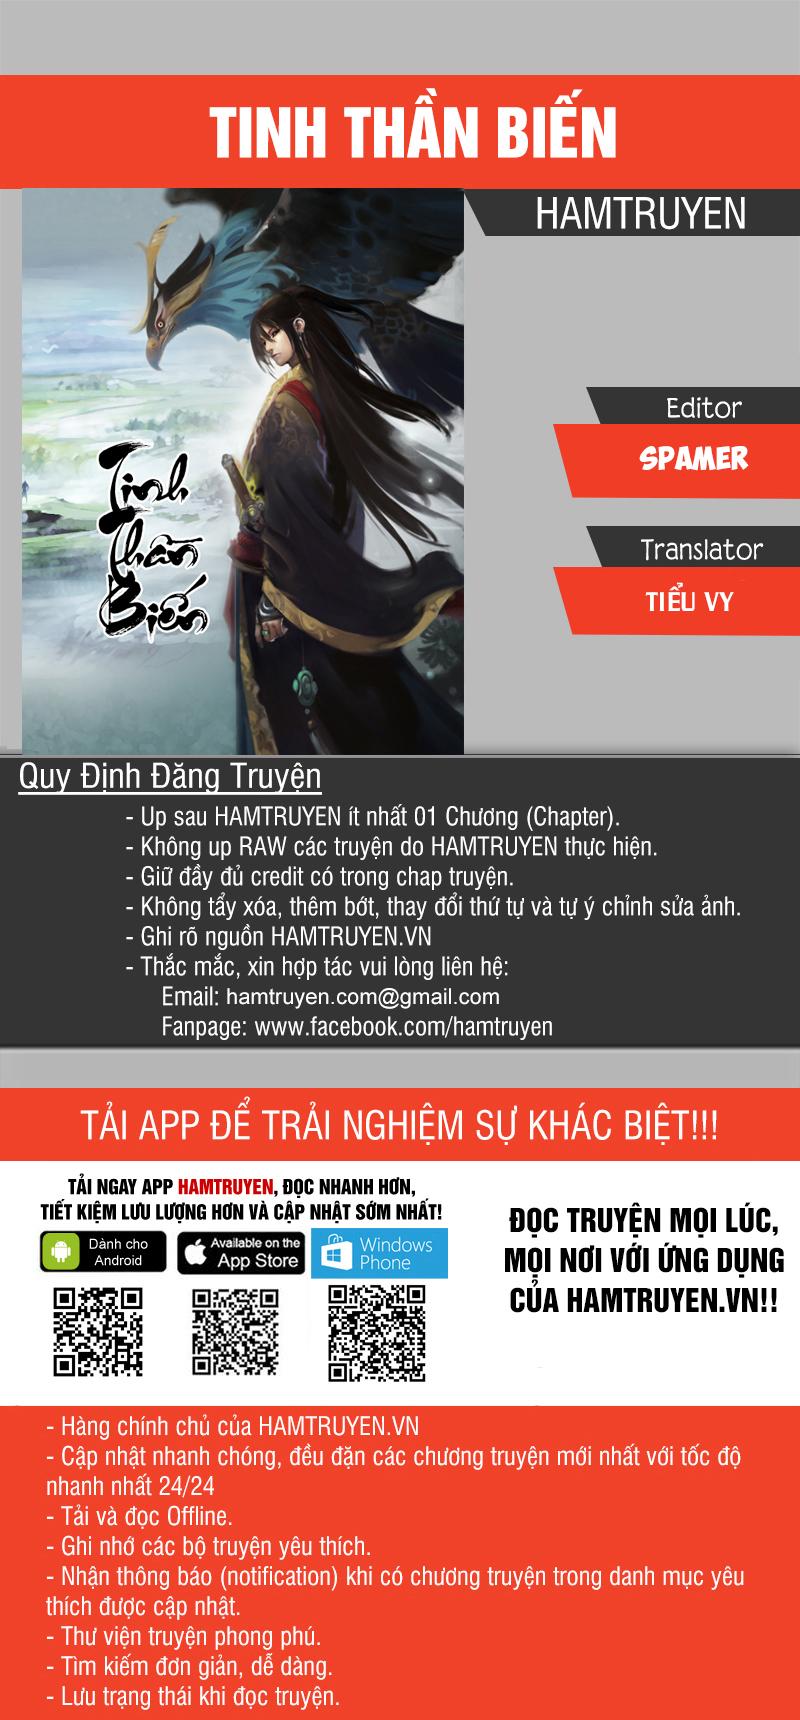 Tinh Thần Biến Chapter 445 - Upload bởi truyensieuhay.com